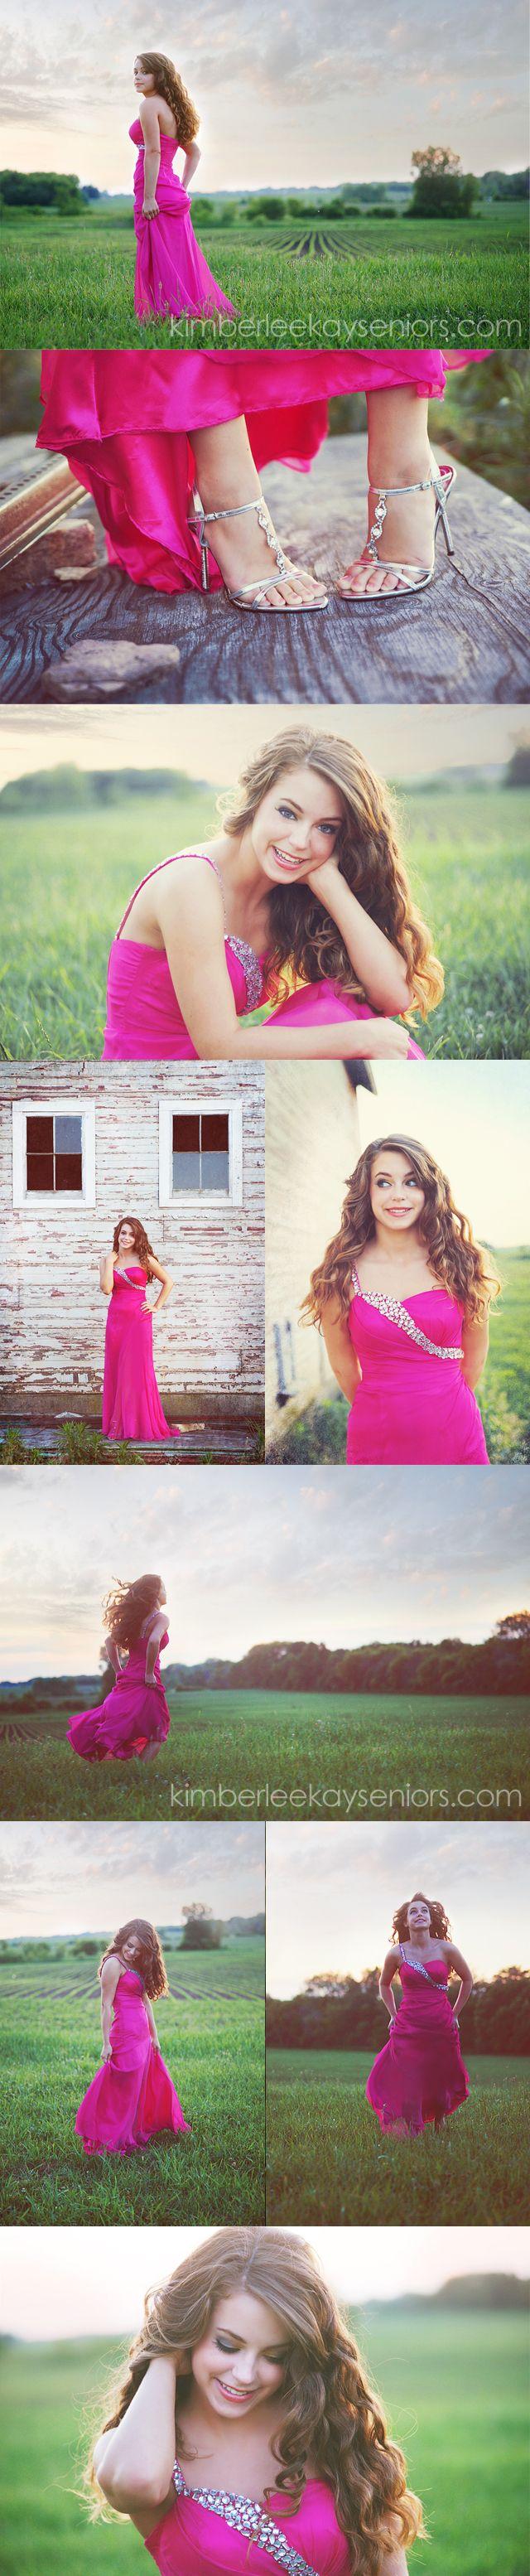 be a princess, wear your prom dress again! Cute senior option.